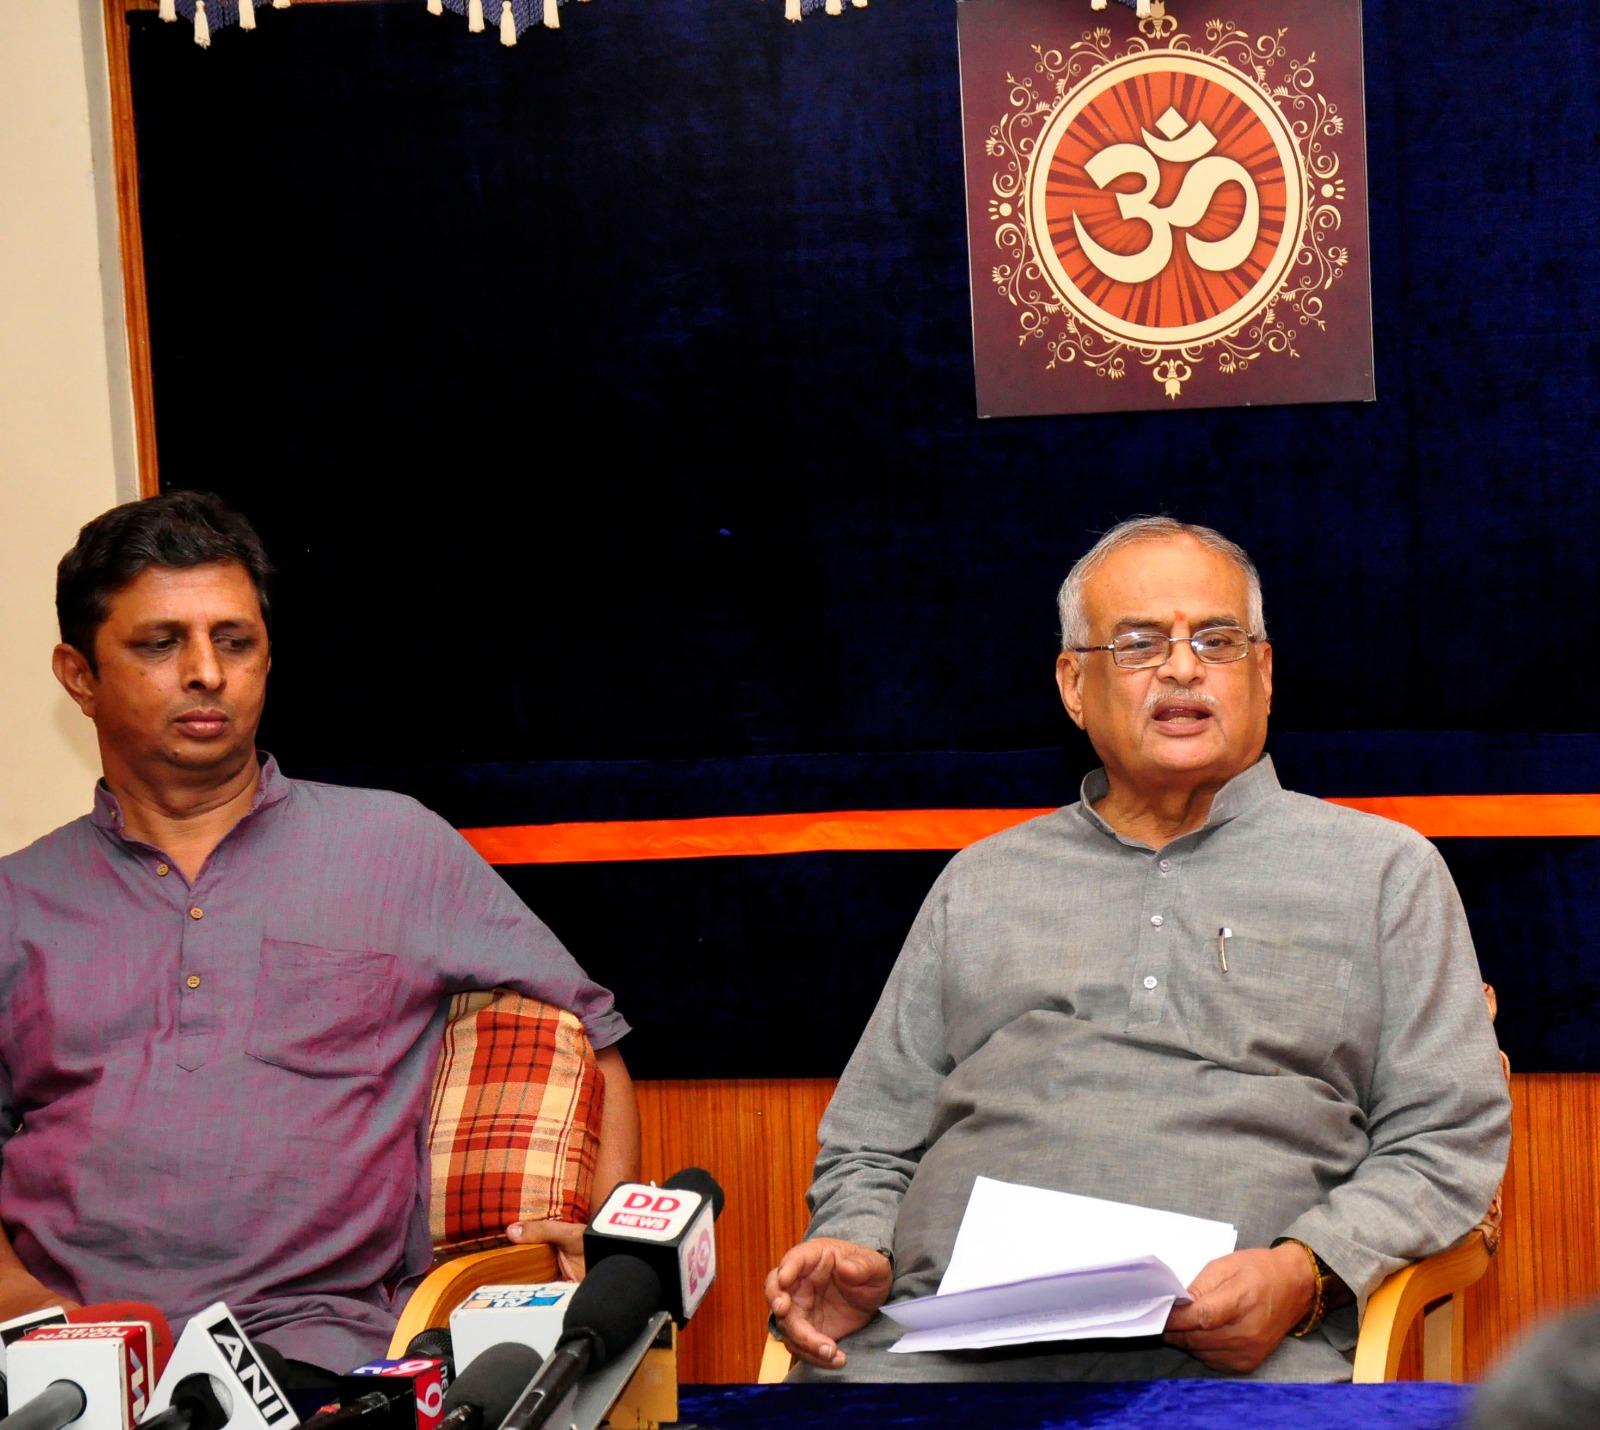 'More Youth joining RSS across the Nation': RSS Kshetreeya Sanghachalak V Nagaraj at Press Meet in Bengaluru